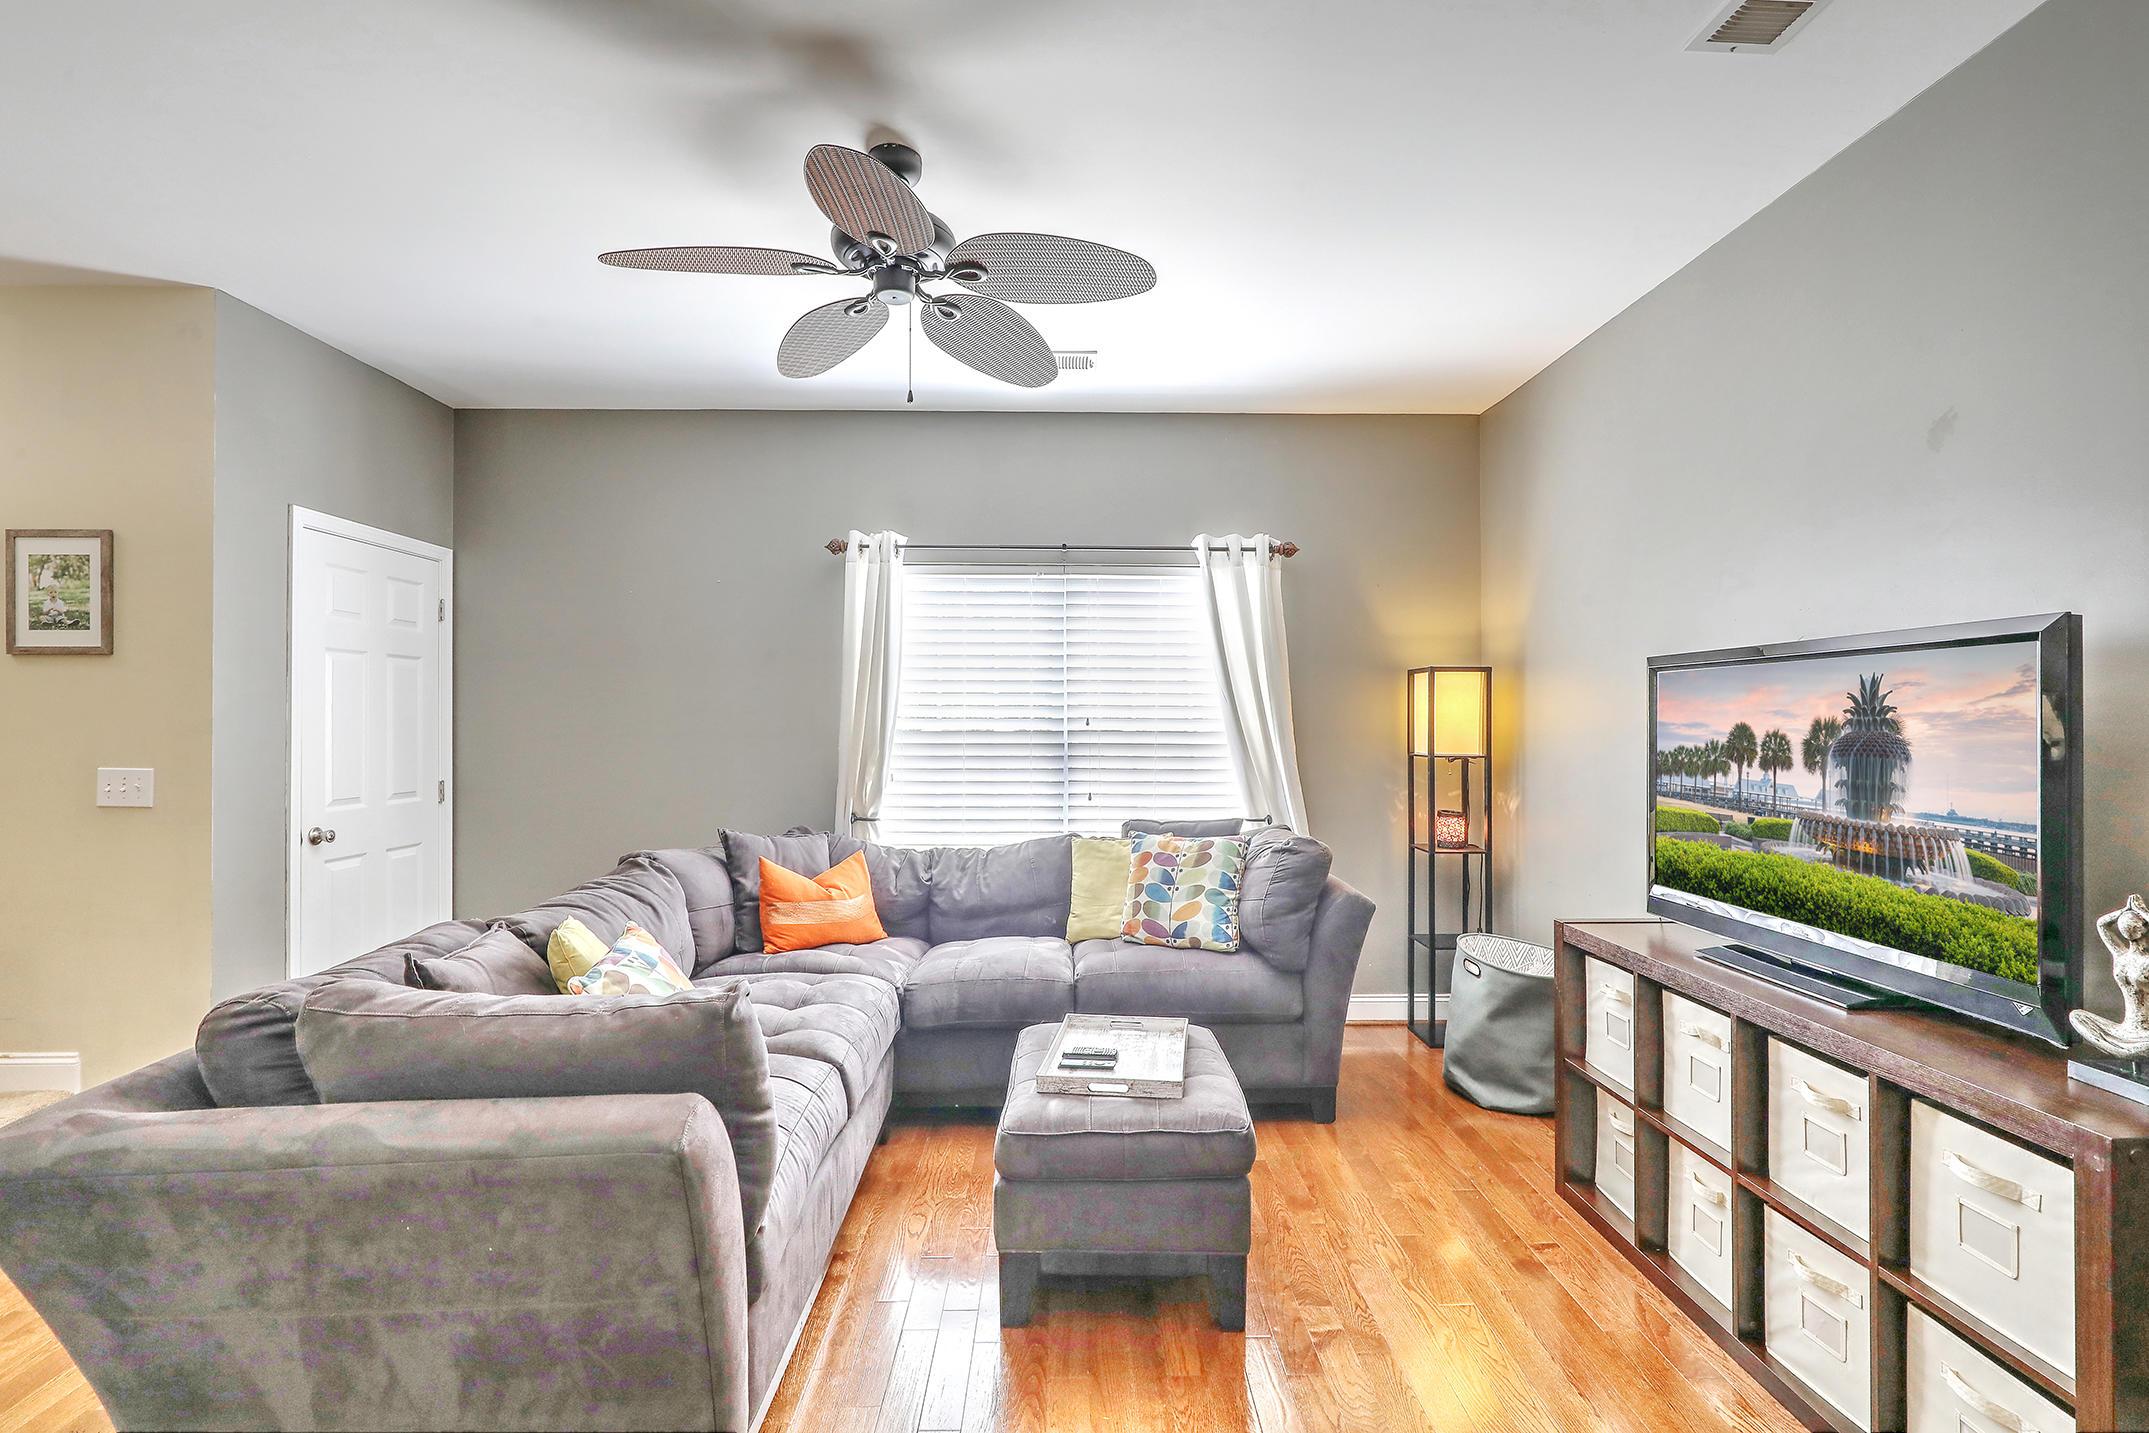 Ashley Park Homes For Sale - 4025 Hartland, Charleston, SC - 13